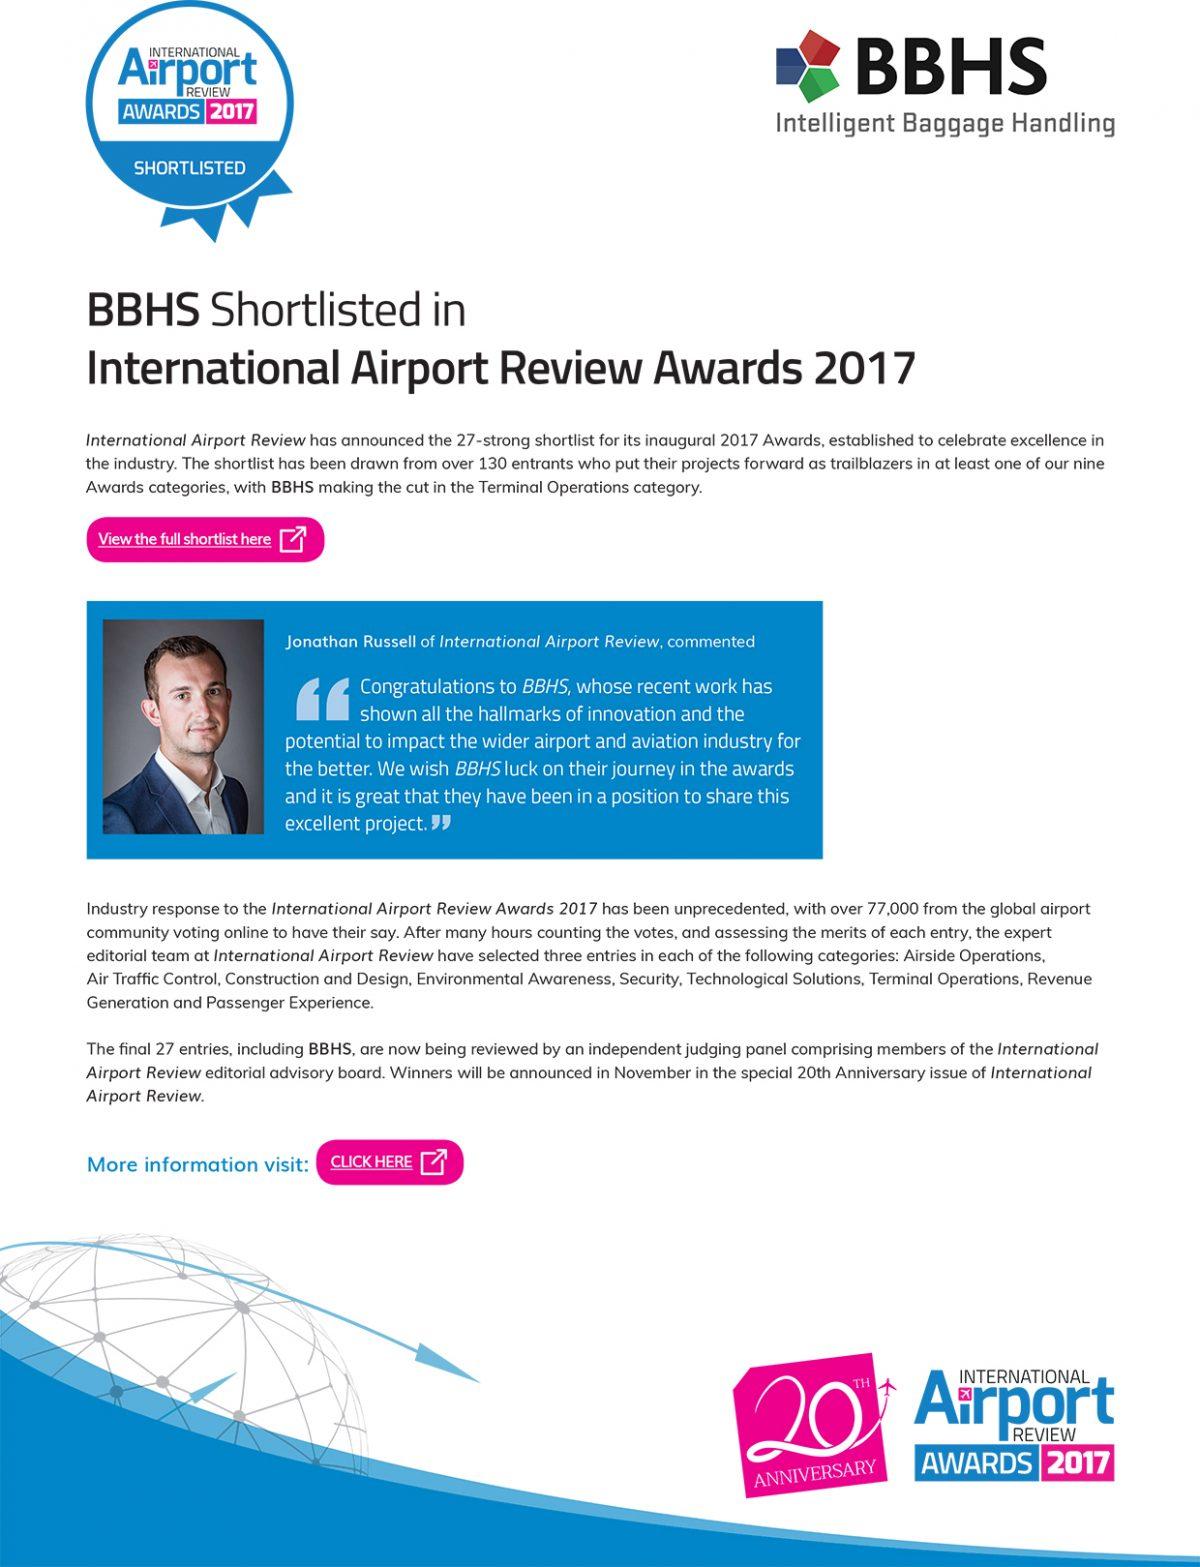 IARA17 Press Release - BBHS